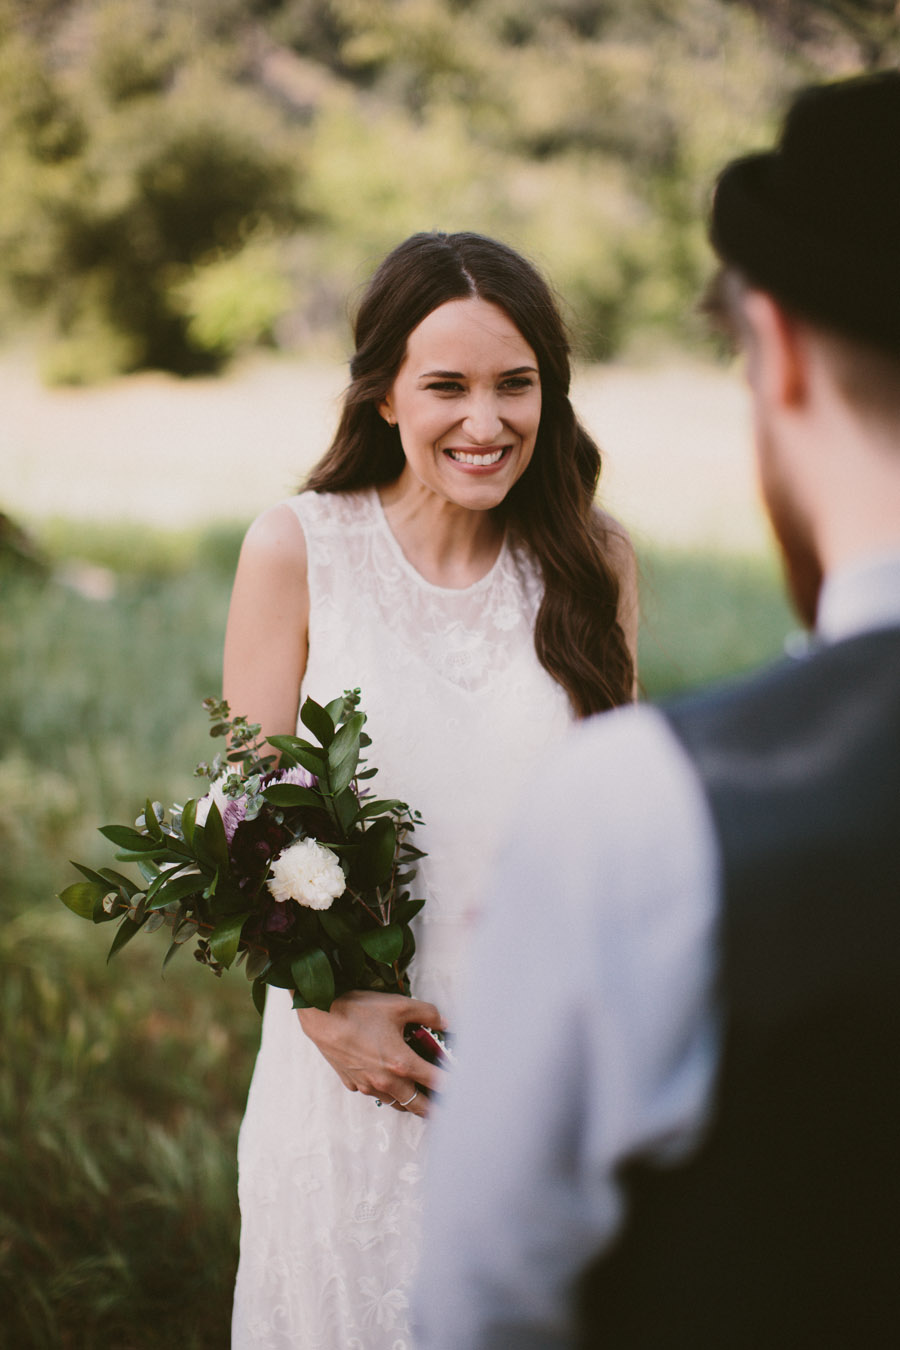 sandiego_wedding_photographer_12.jpg